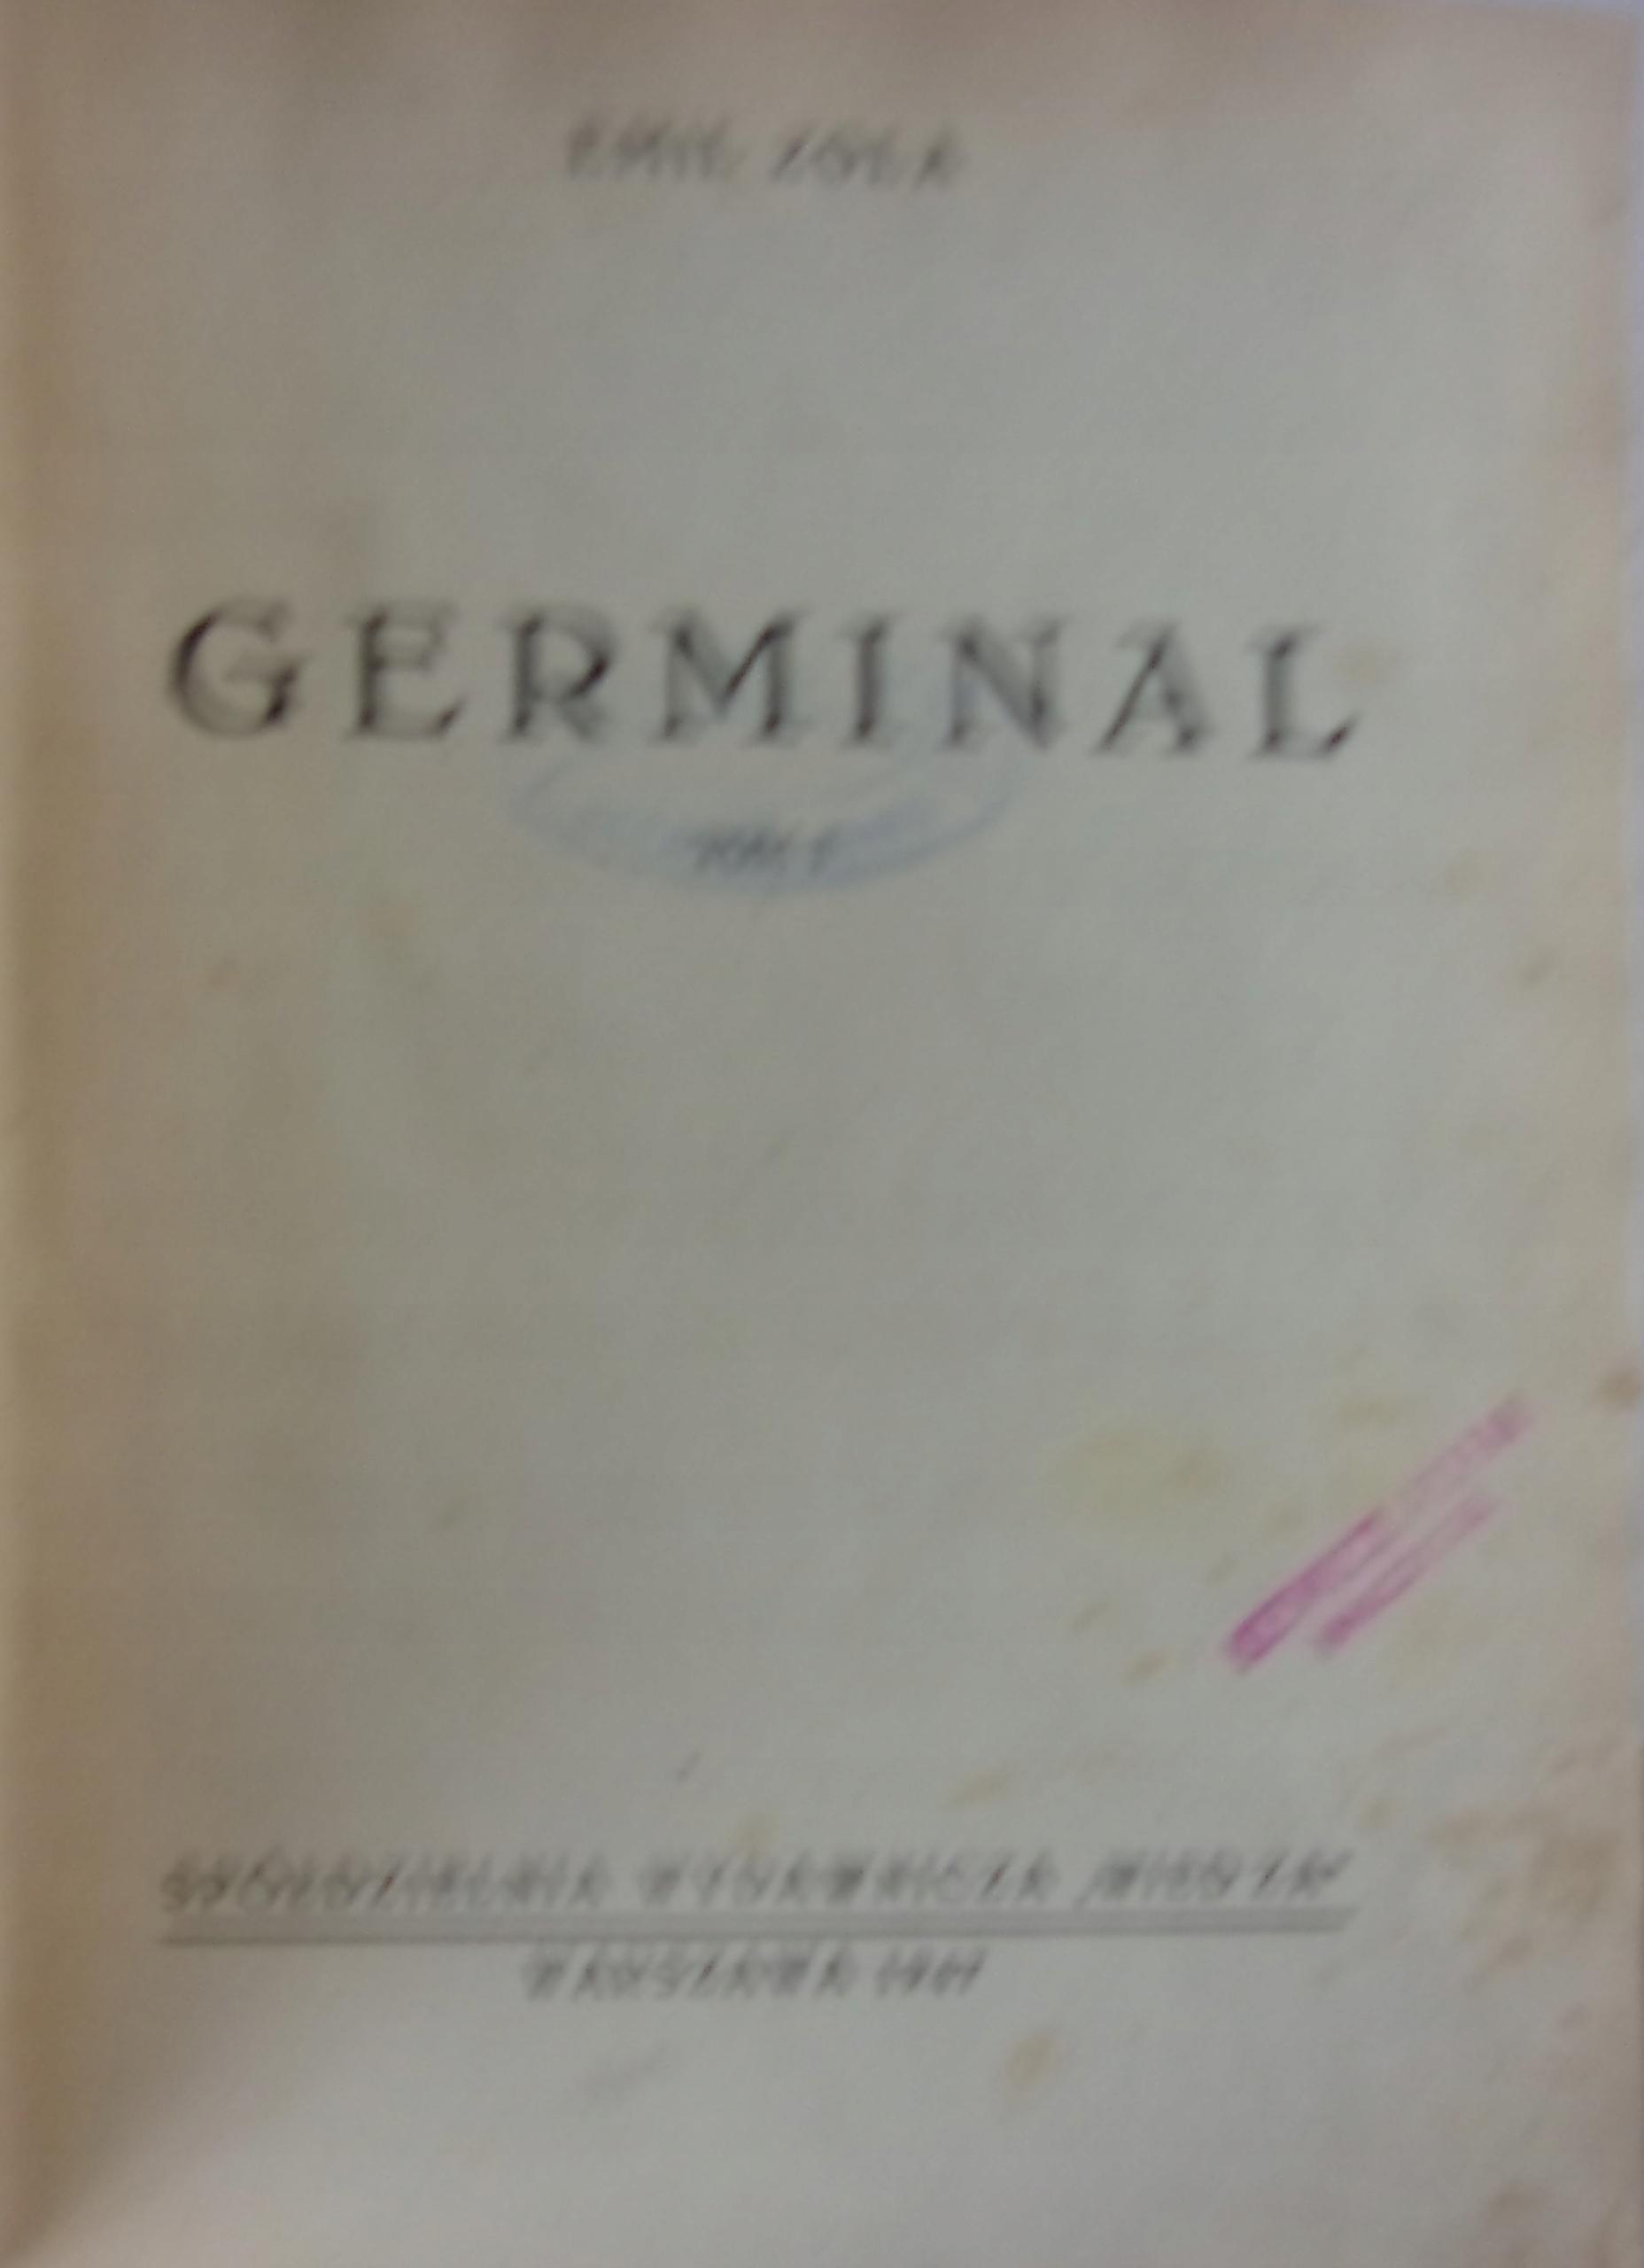 Germinal. Tom I-II. 1947 r.